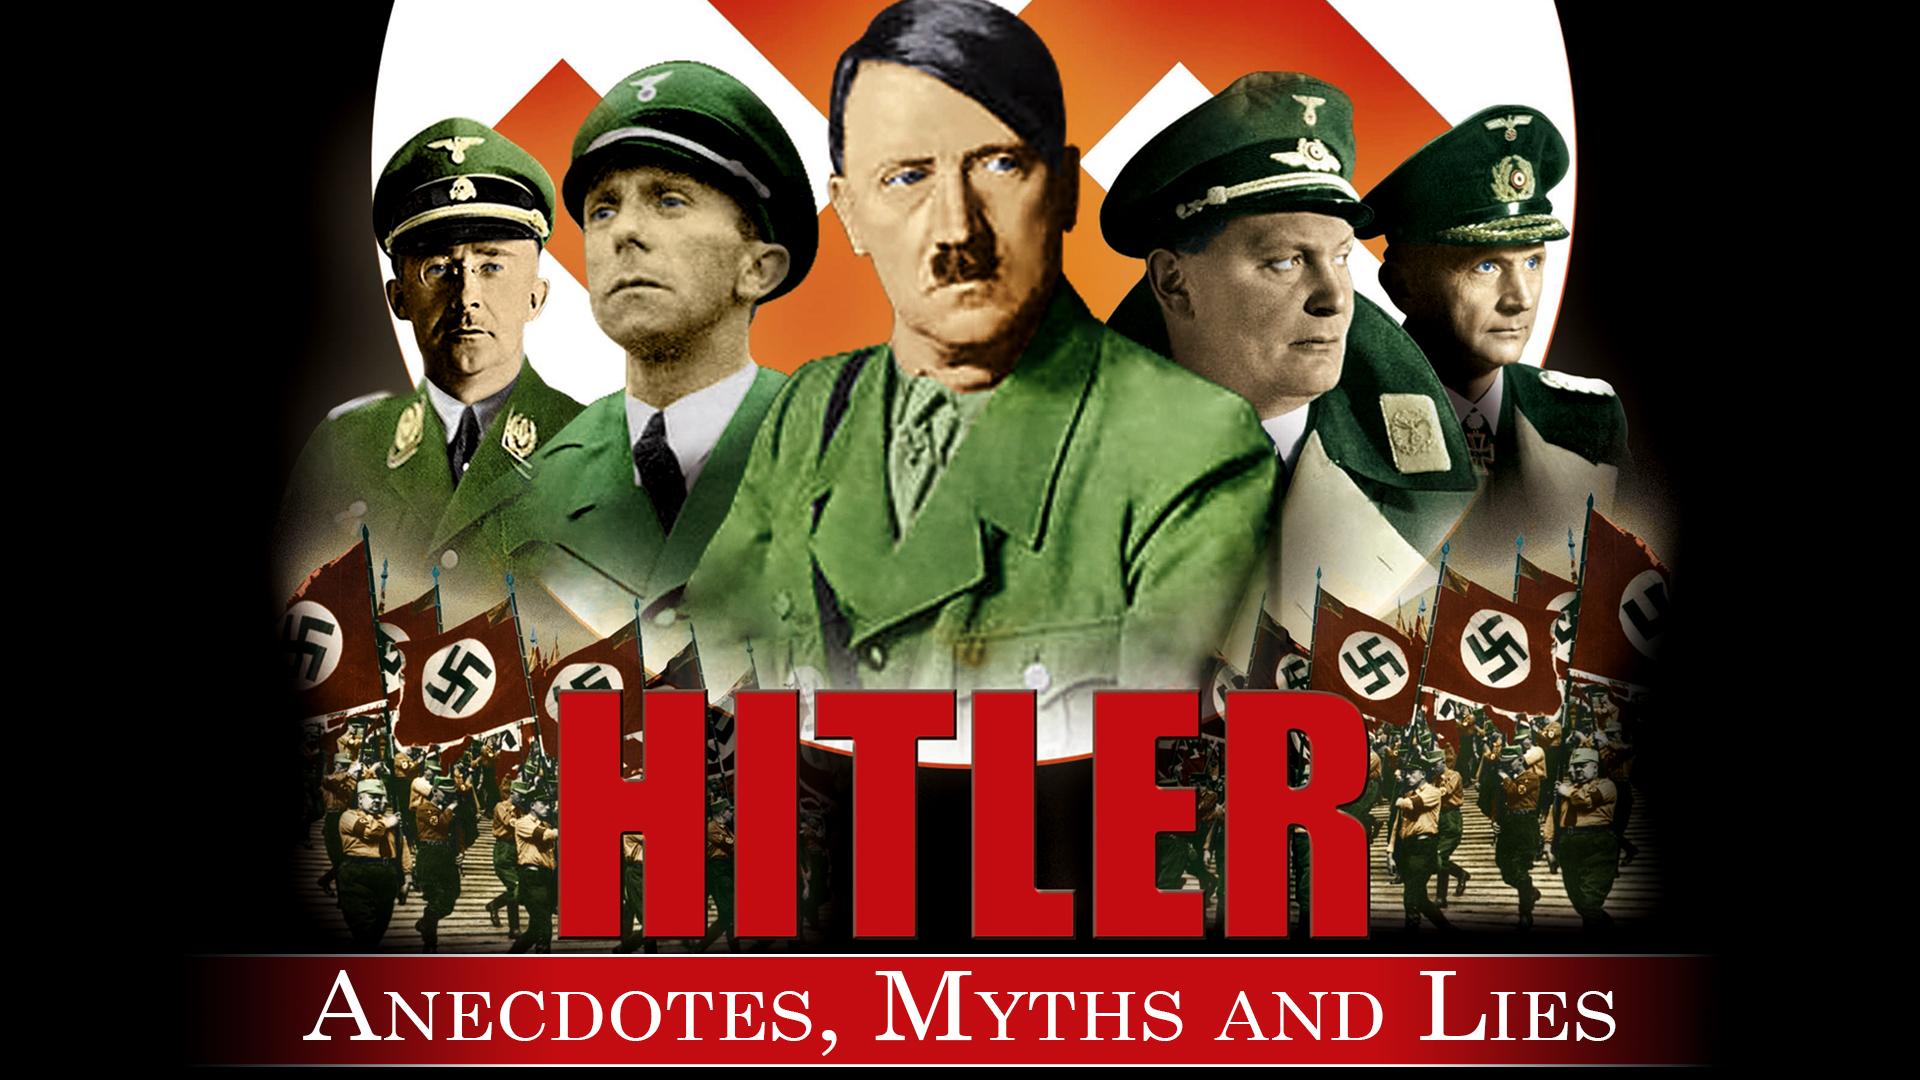 Hitler - Anecdotes, Myths and Lies